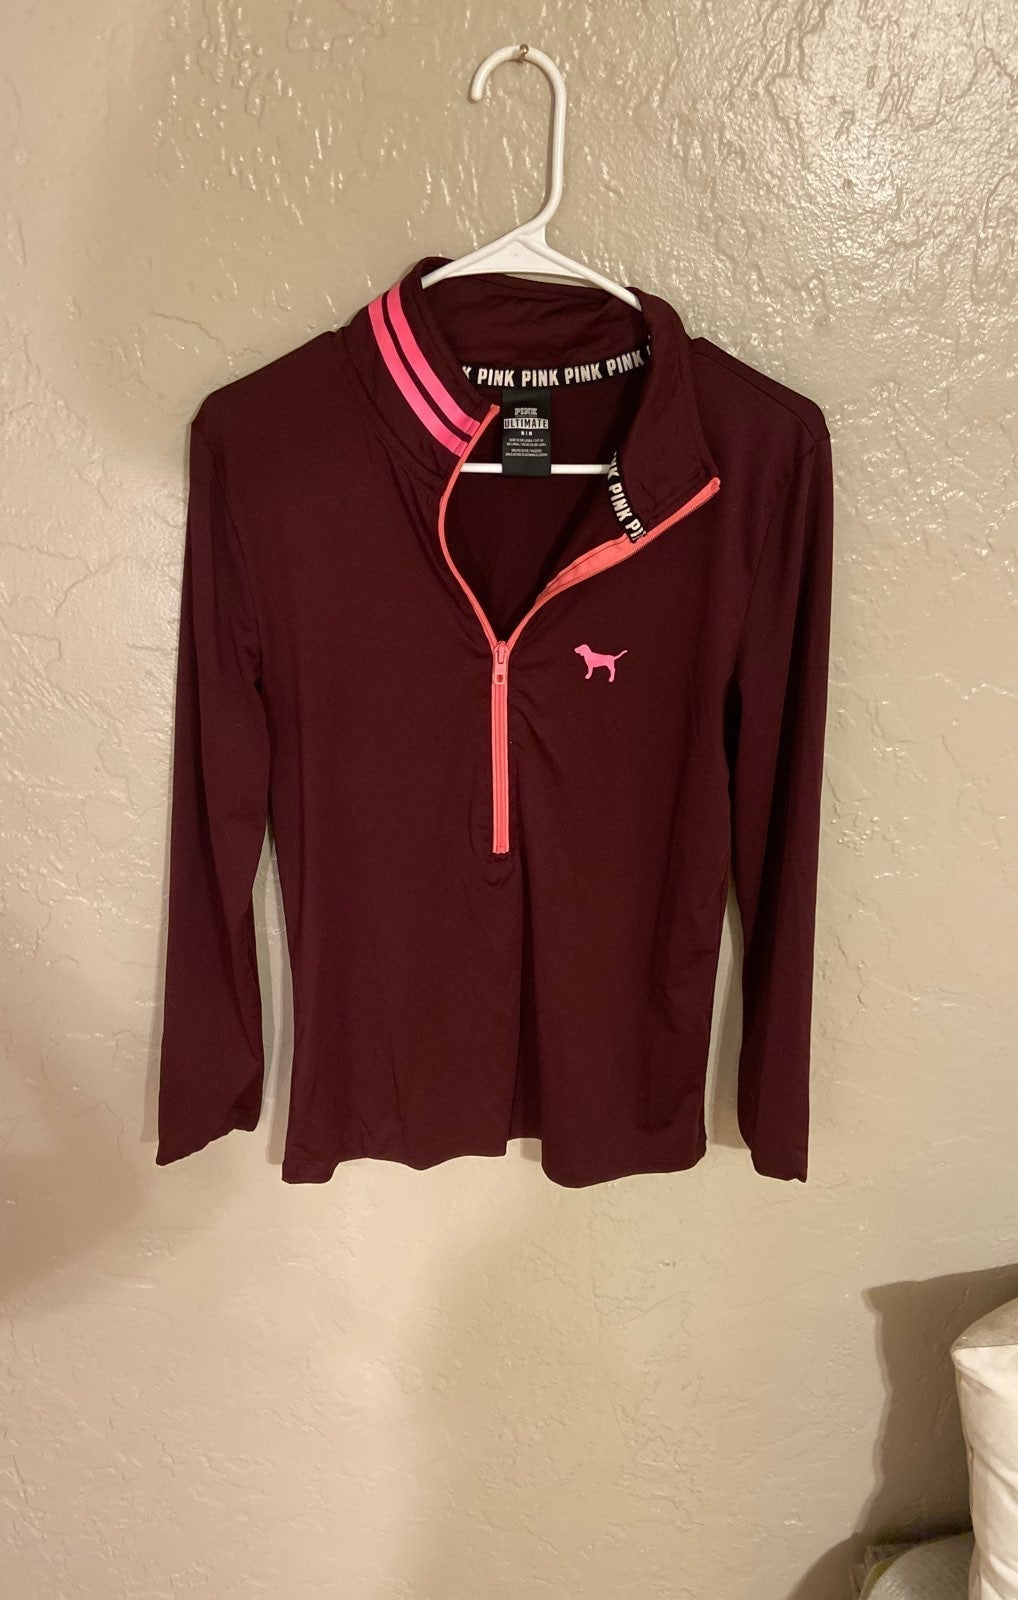 VS Pink long athletic top